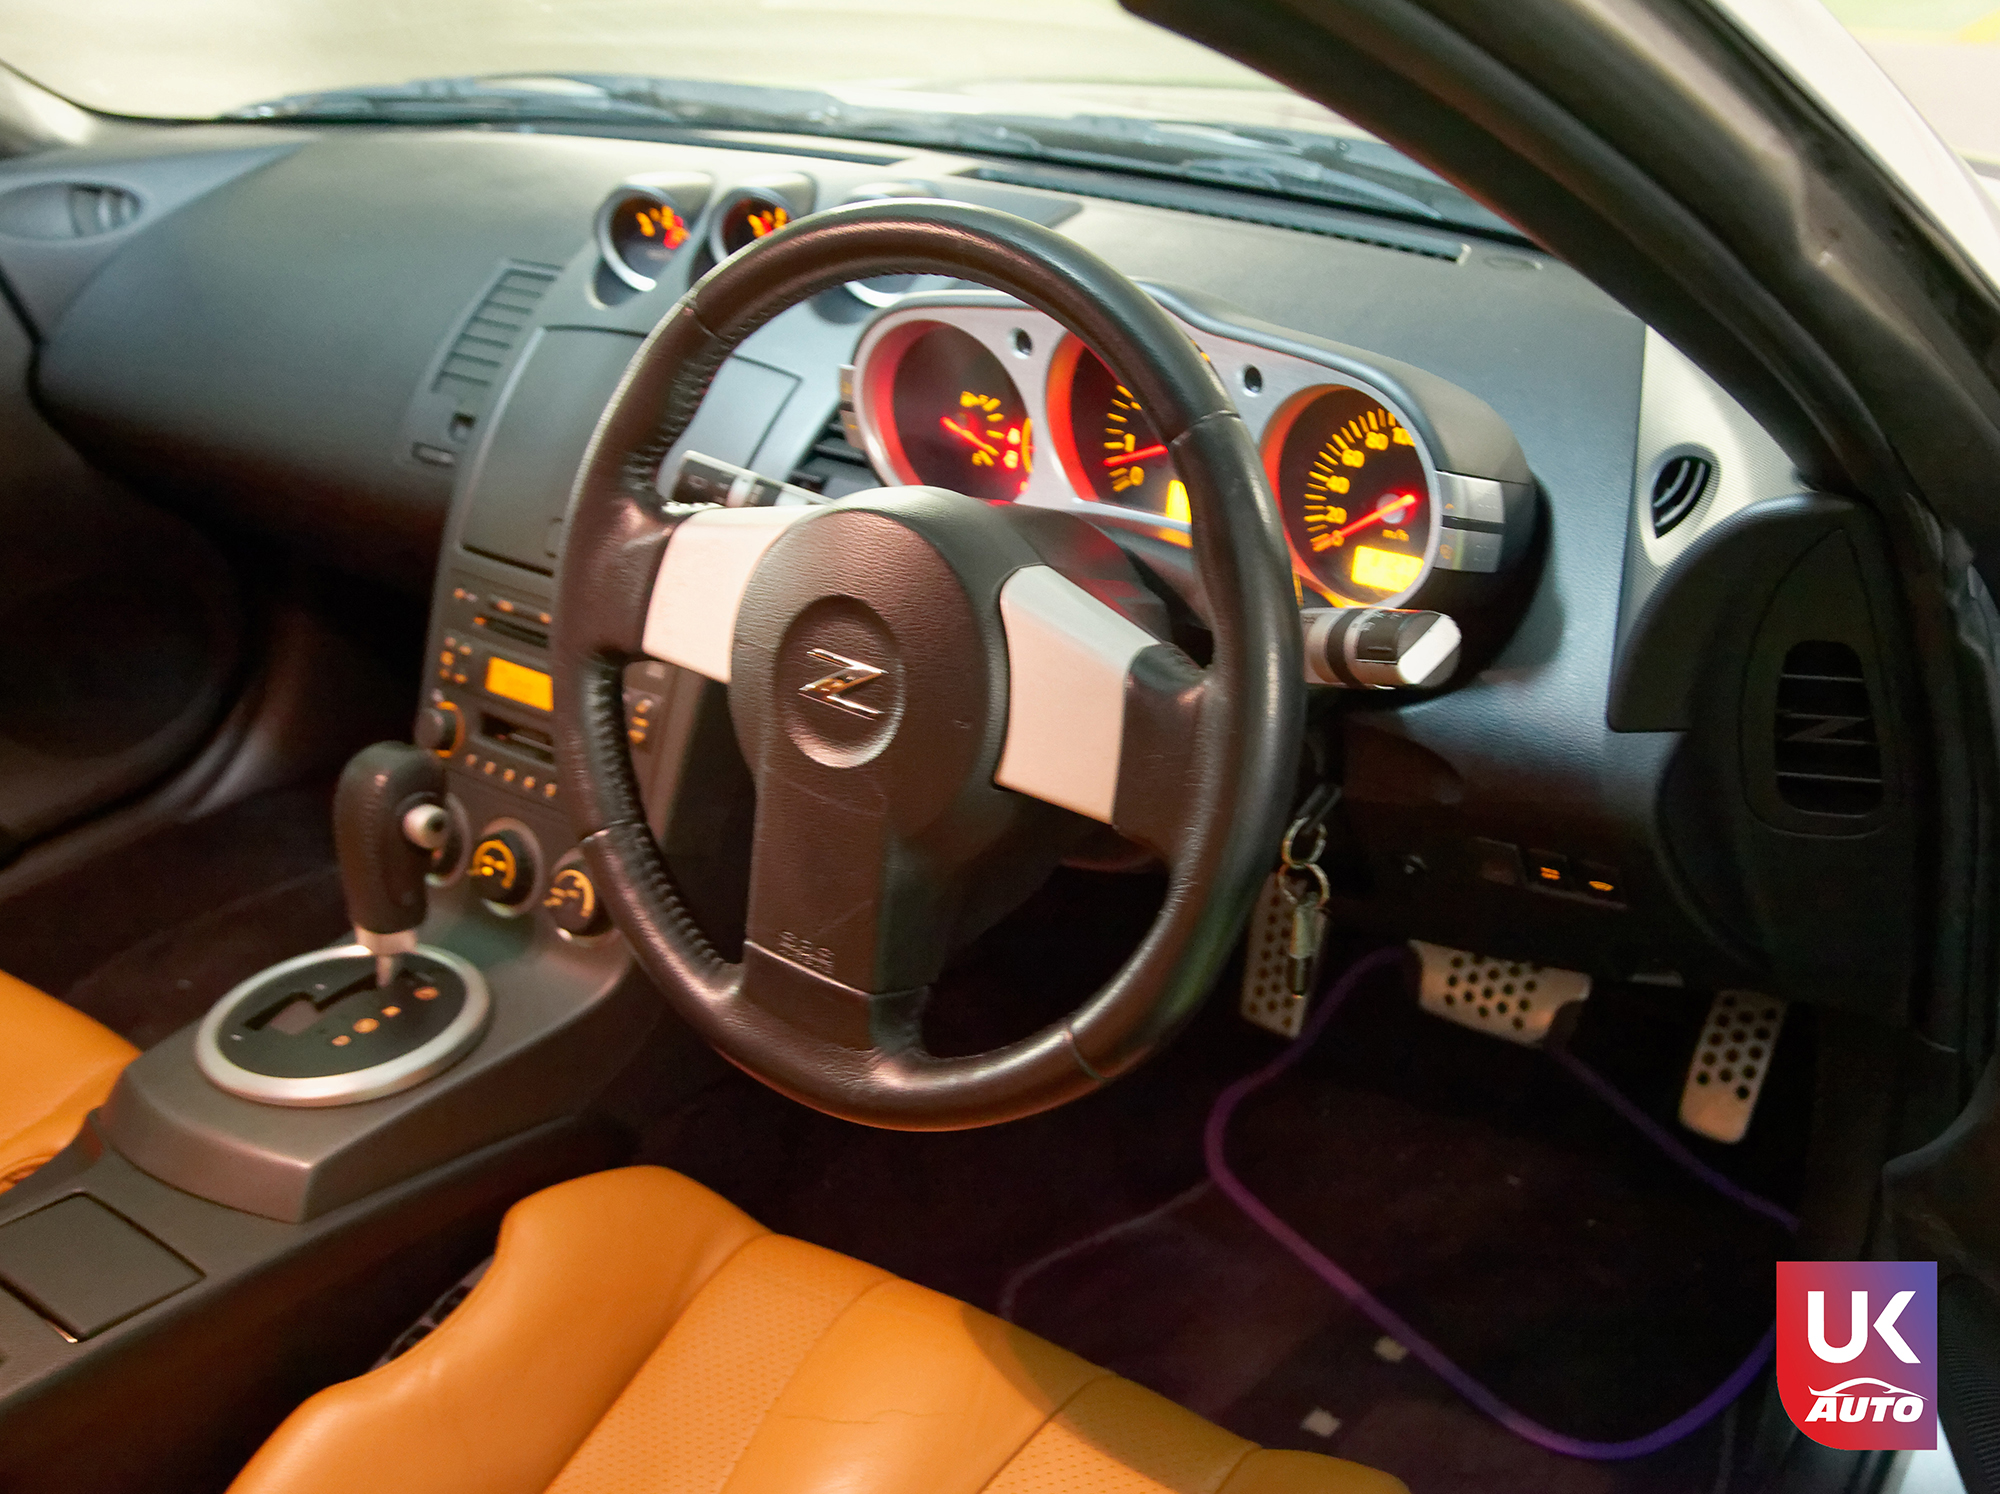 Ukauto import nissan 350z jdm import fairlady v6 import uk ukauto rhd nissan import uk9 - Import Nissan 350Z JDM IMPORT 3.5 V6 TIPTRONIC IMPORT AUTO par UKAUTO